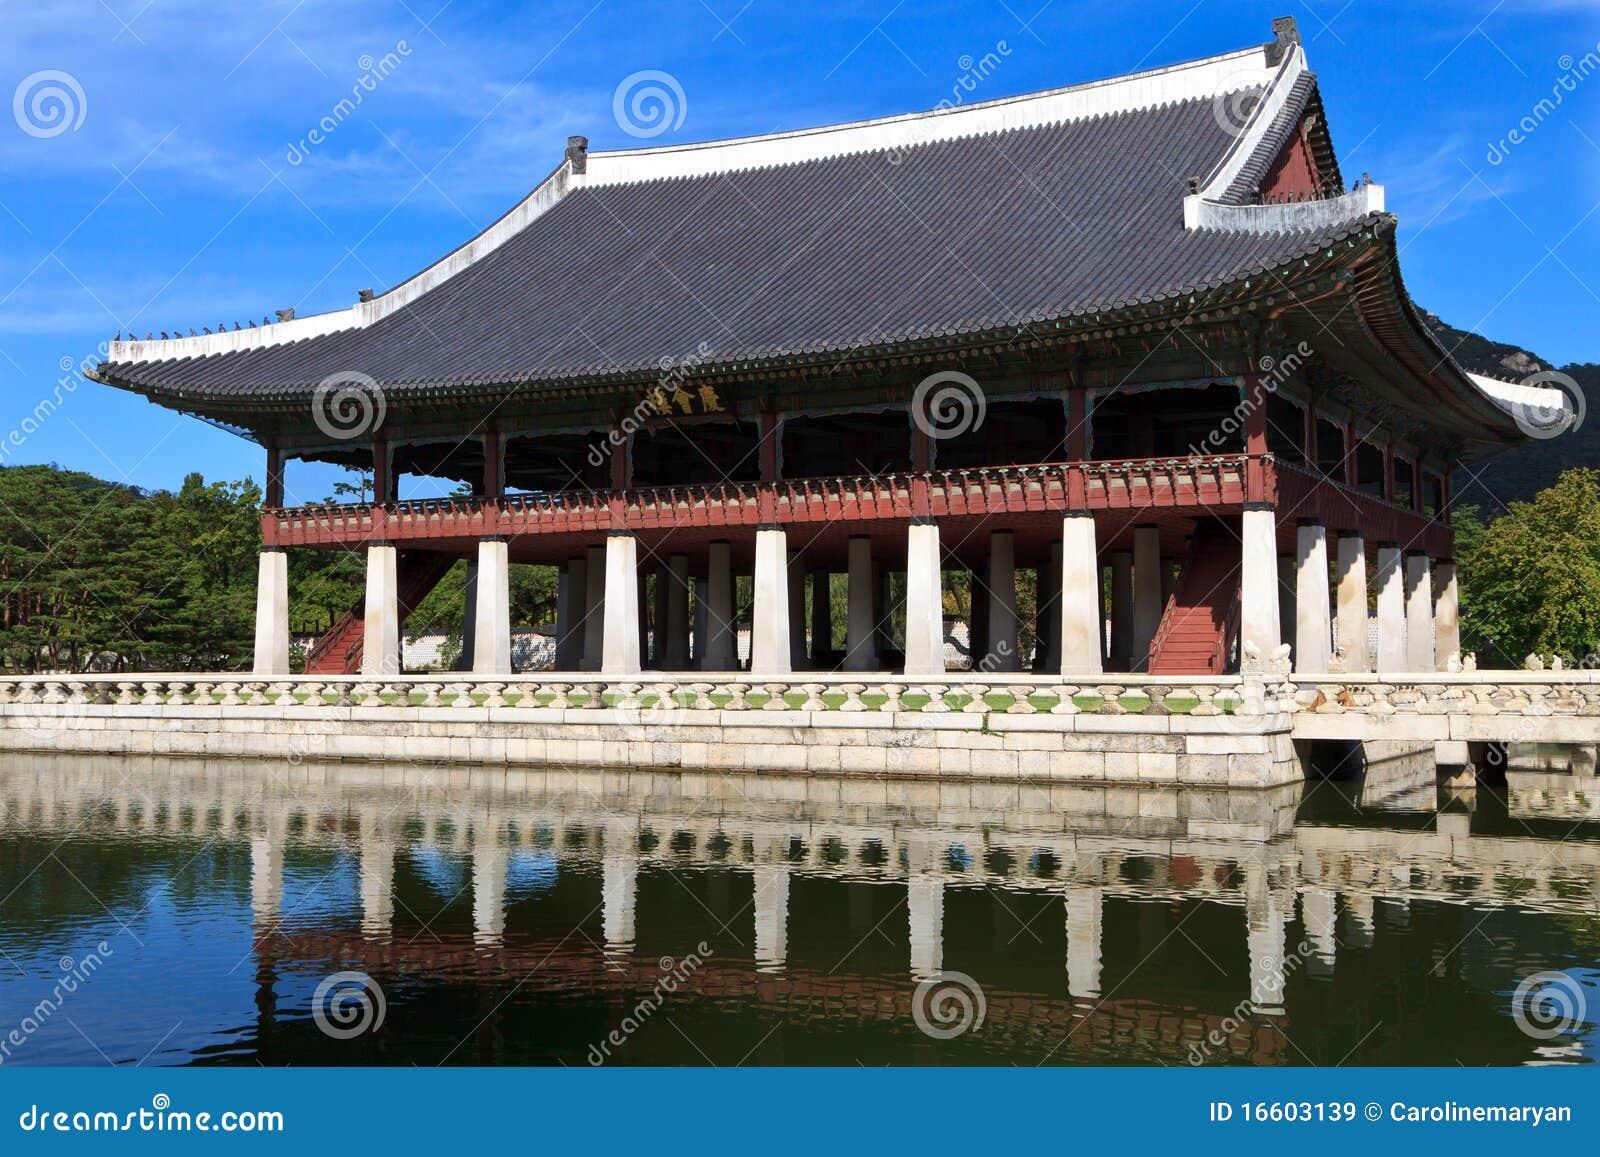 Gyeonghoeru Pavilion in Seoul, South Korea